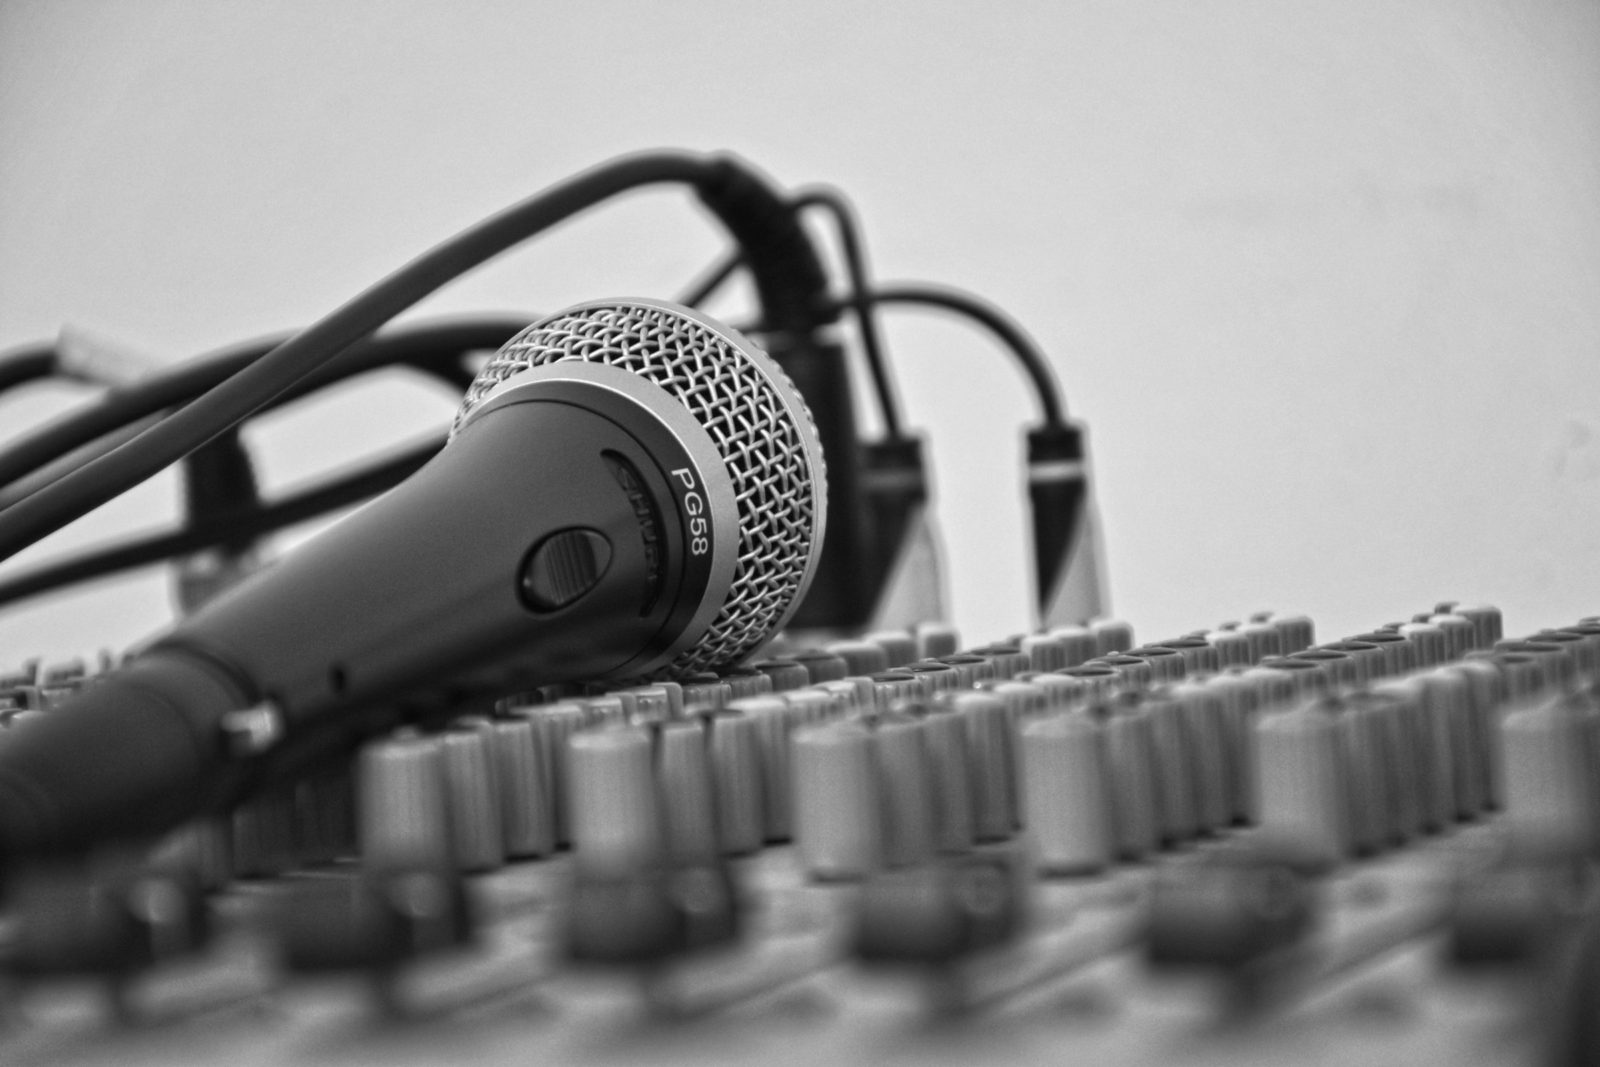 Music Gear, Skonnie Music, Recording